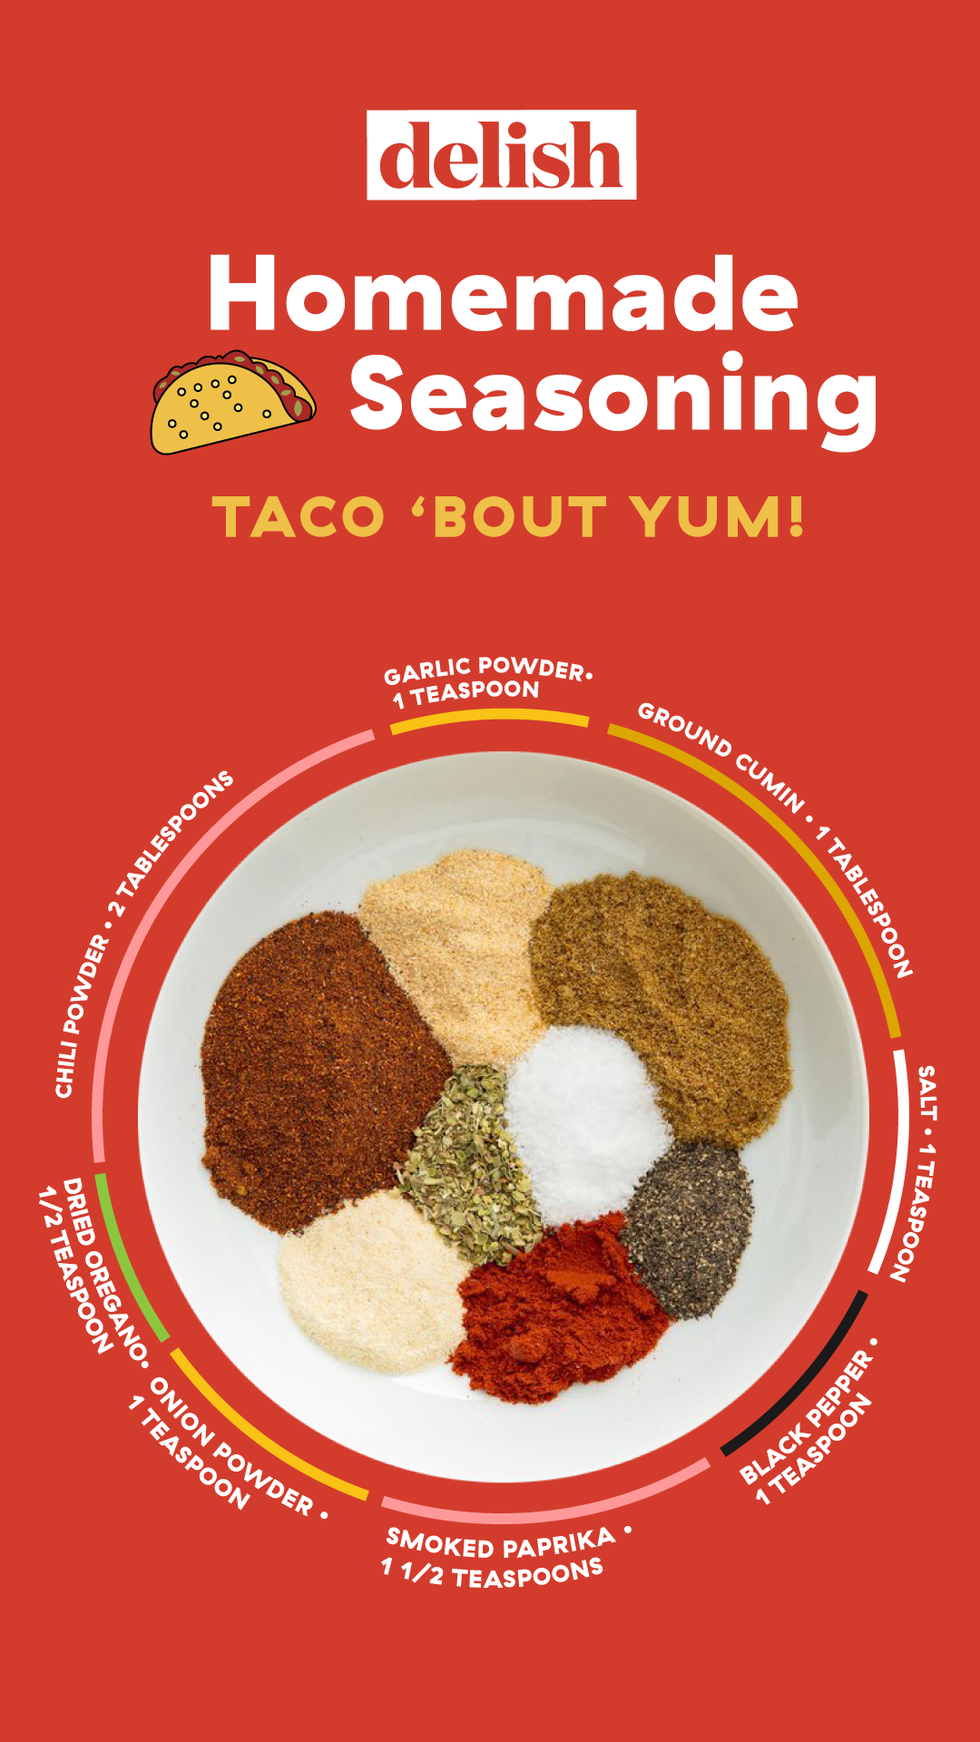 Never Buy Taco Seasoning Again